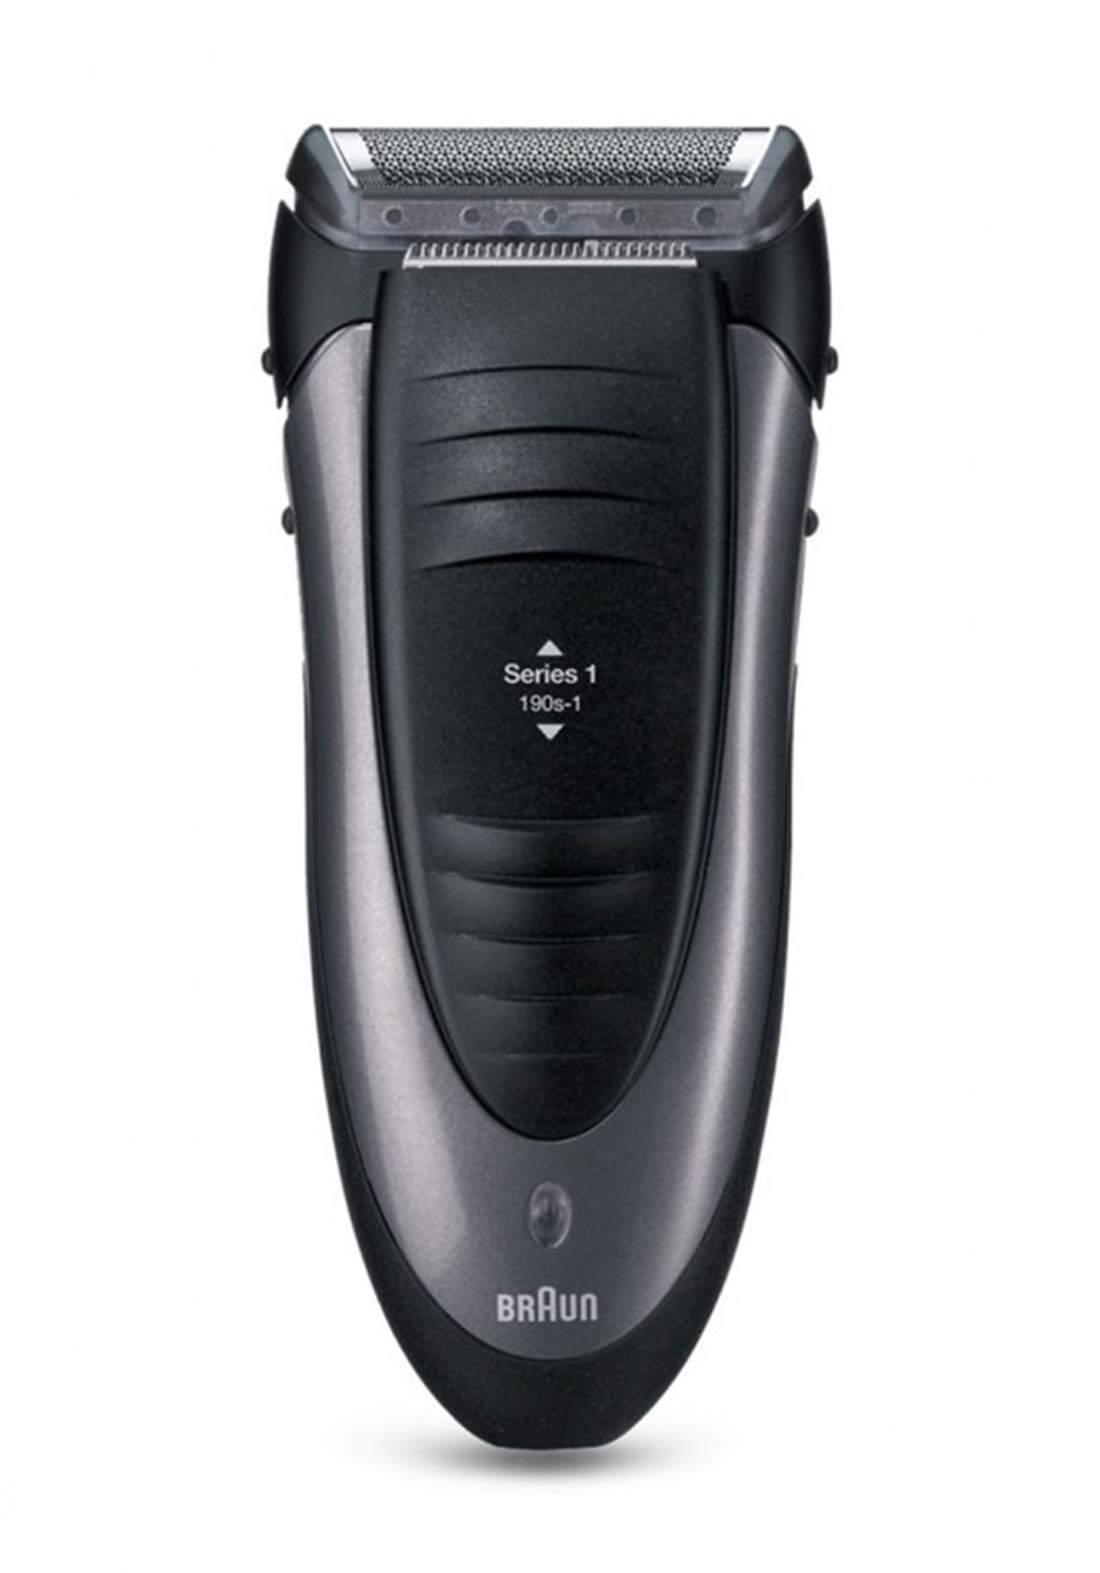 Braun 190s-1 shaver ماكنة حلاقة رجالية